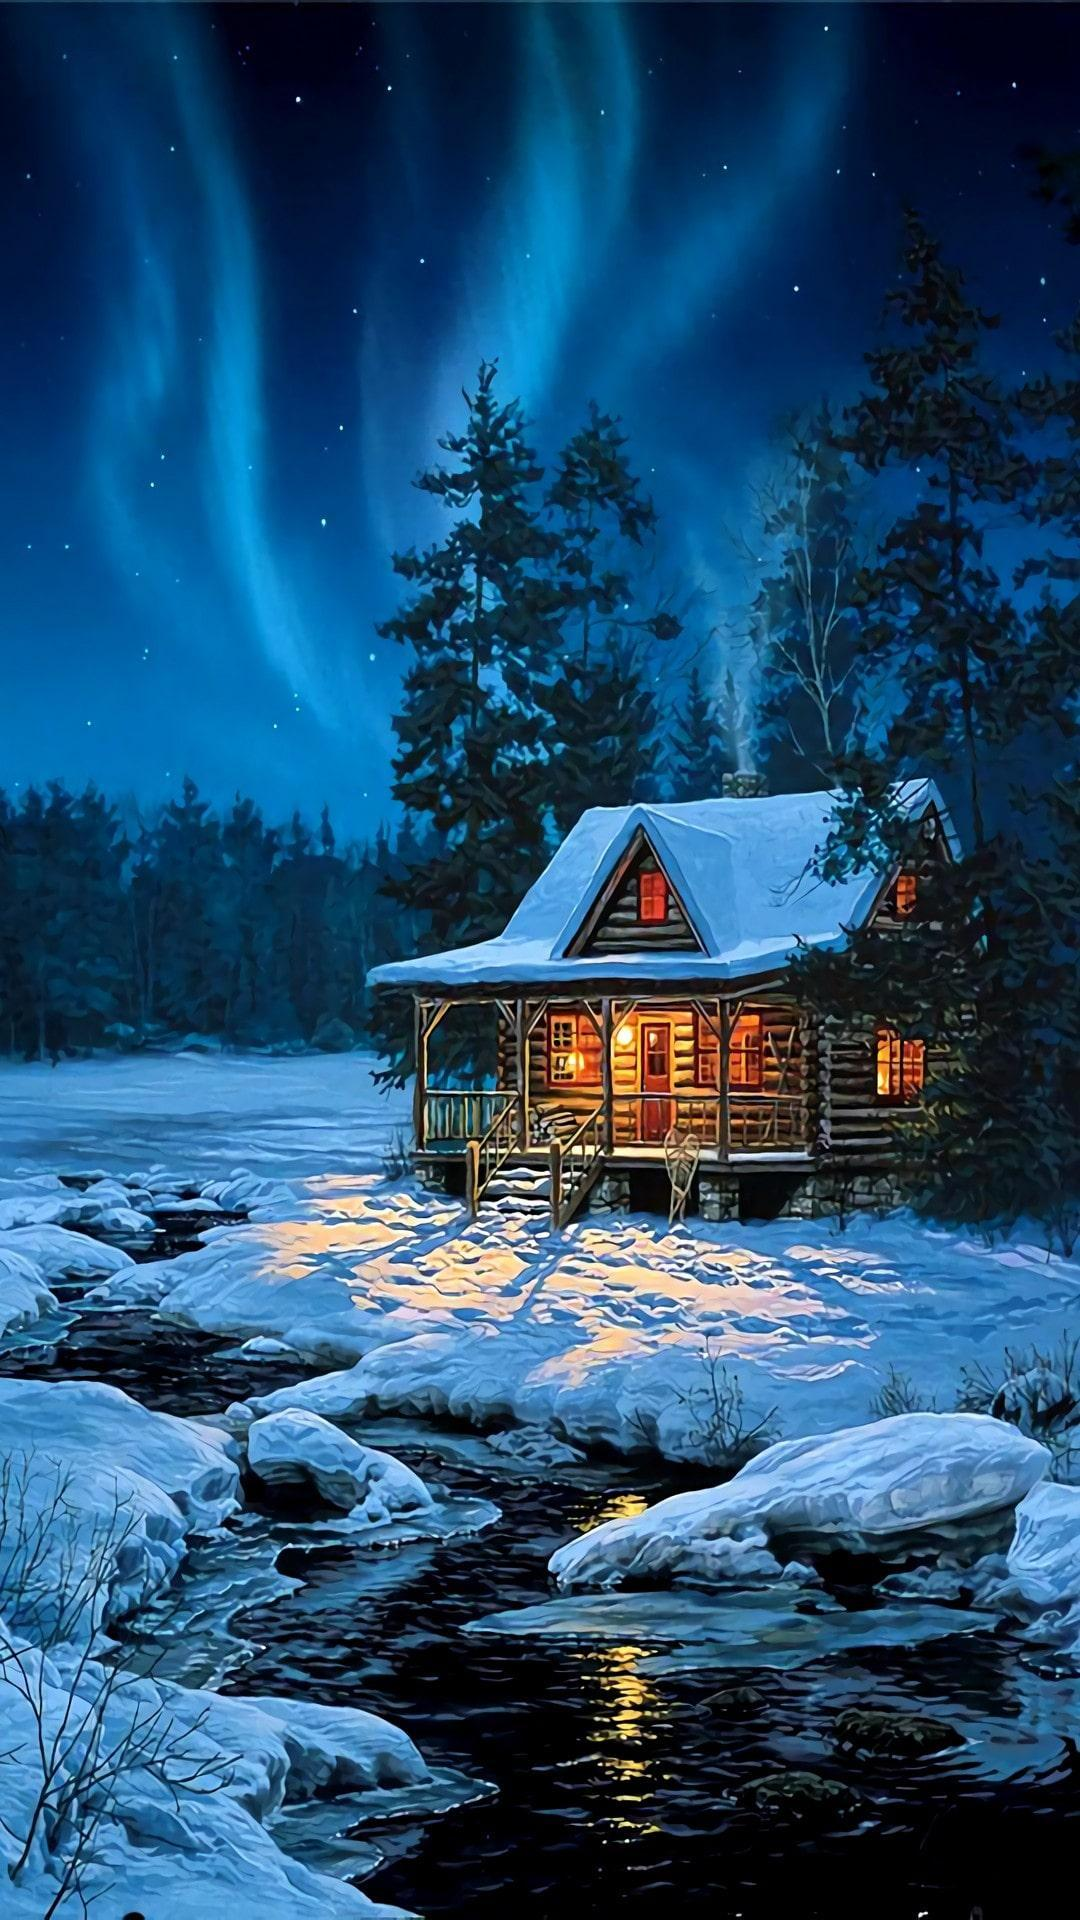 Winter Hut Iphone Wallpapers